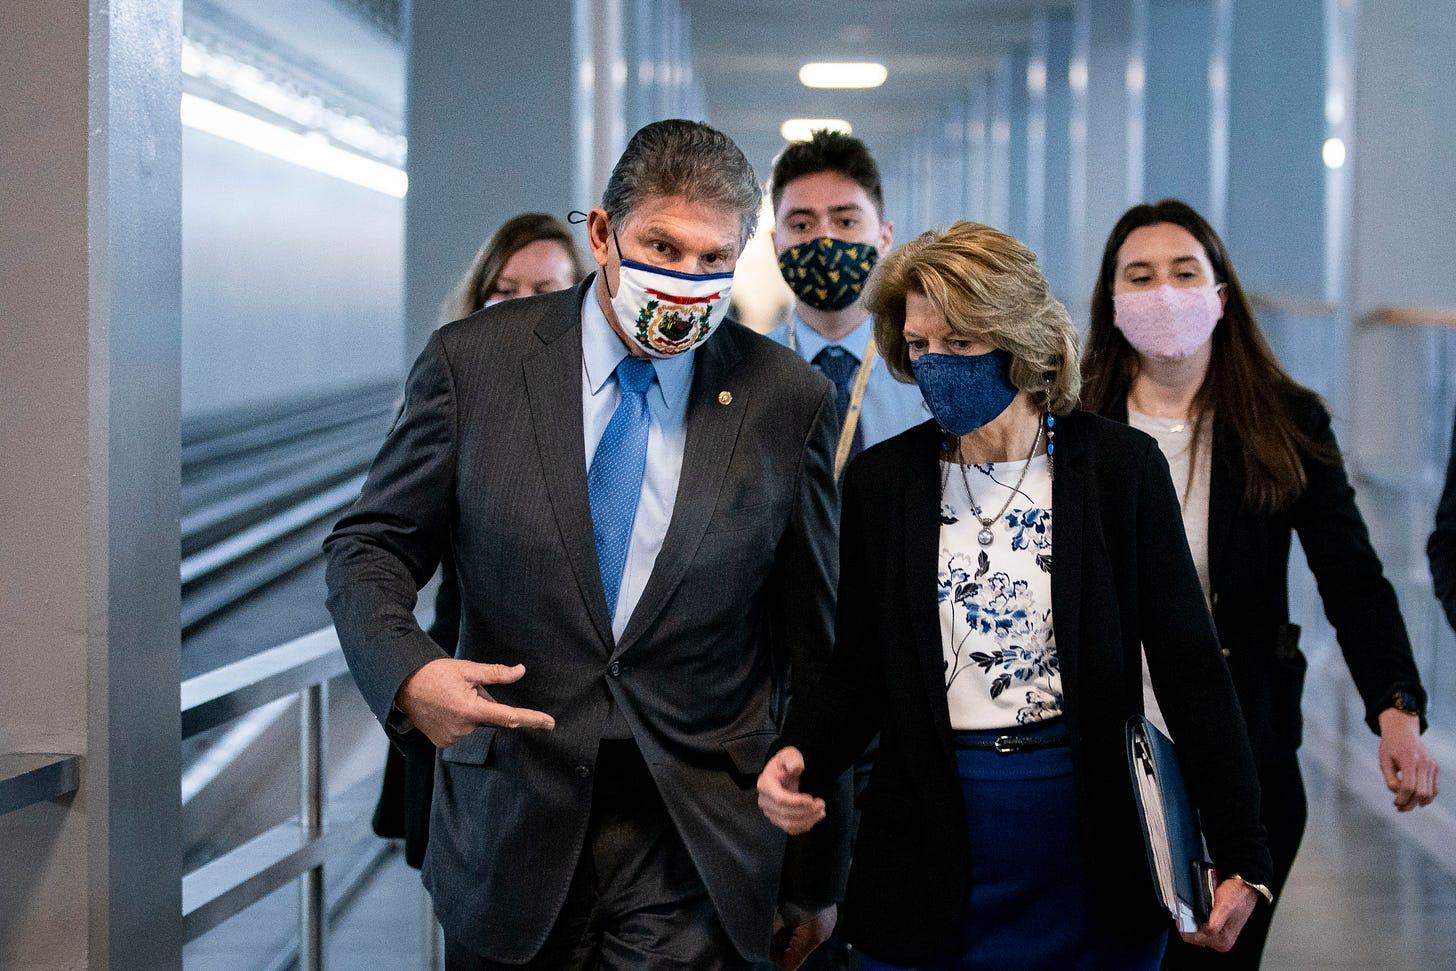 Senators Joe Manchin (D-WV) and Lisa Murkowski (R-AL). (Photo: Getty Images)